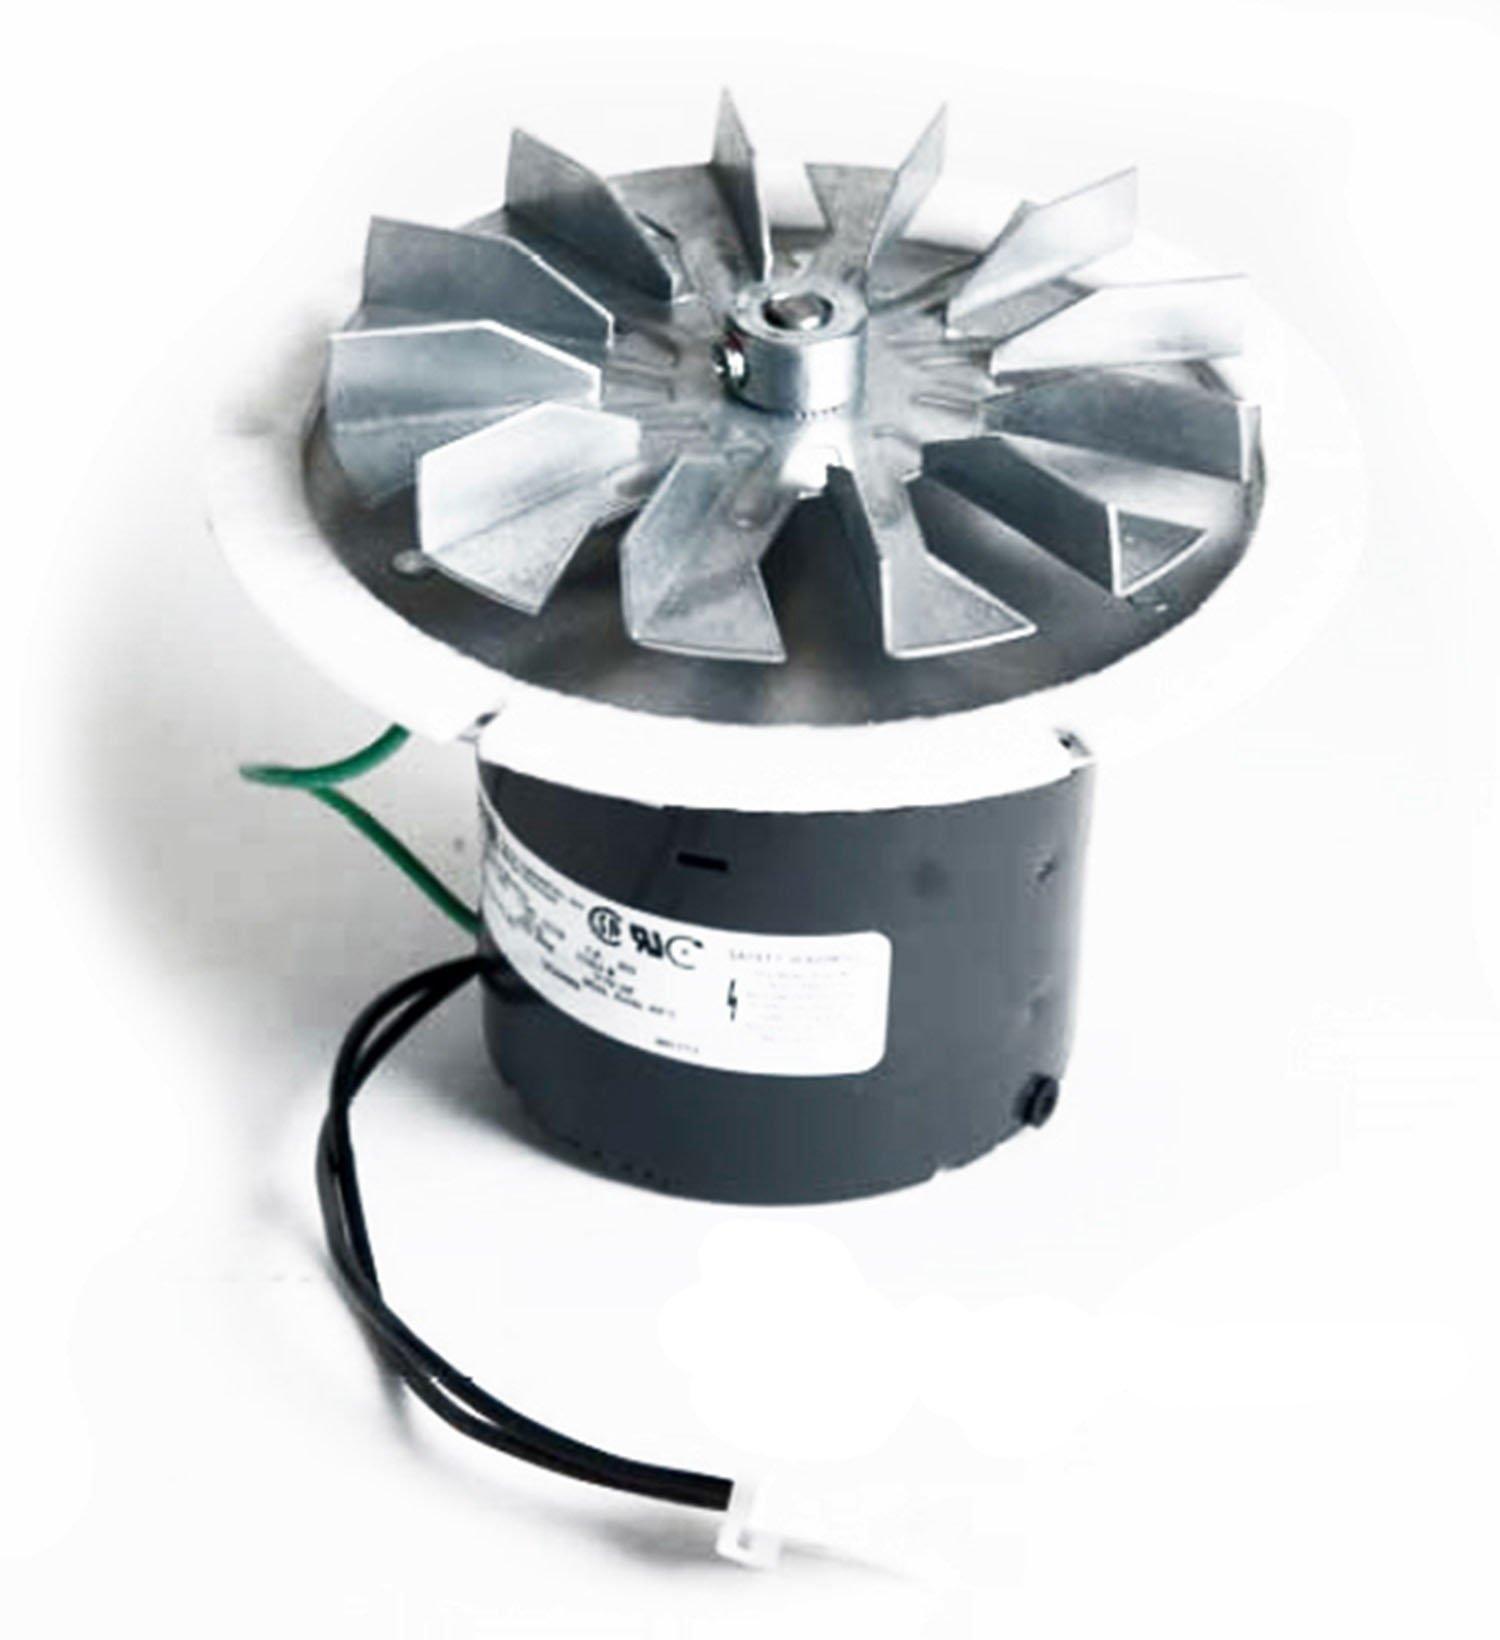 PelletStovePro - Whitfield Advantage I, II, III, Plus Pellet Stove Exhaust Combustion Motor Blower w Housing & Gasket - 12056010, 12126009, 12156009